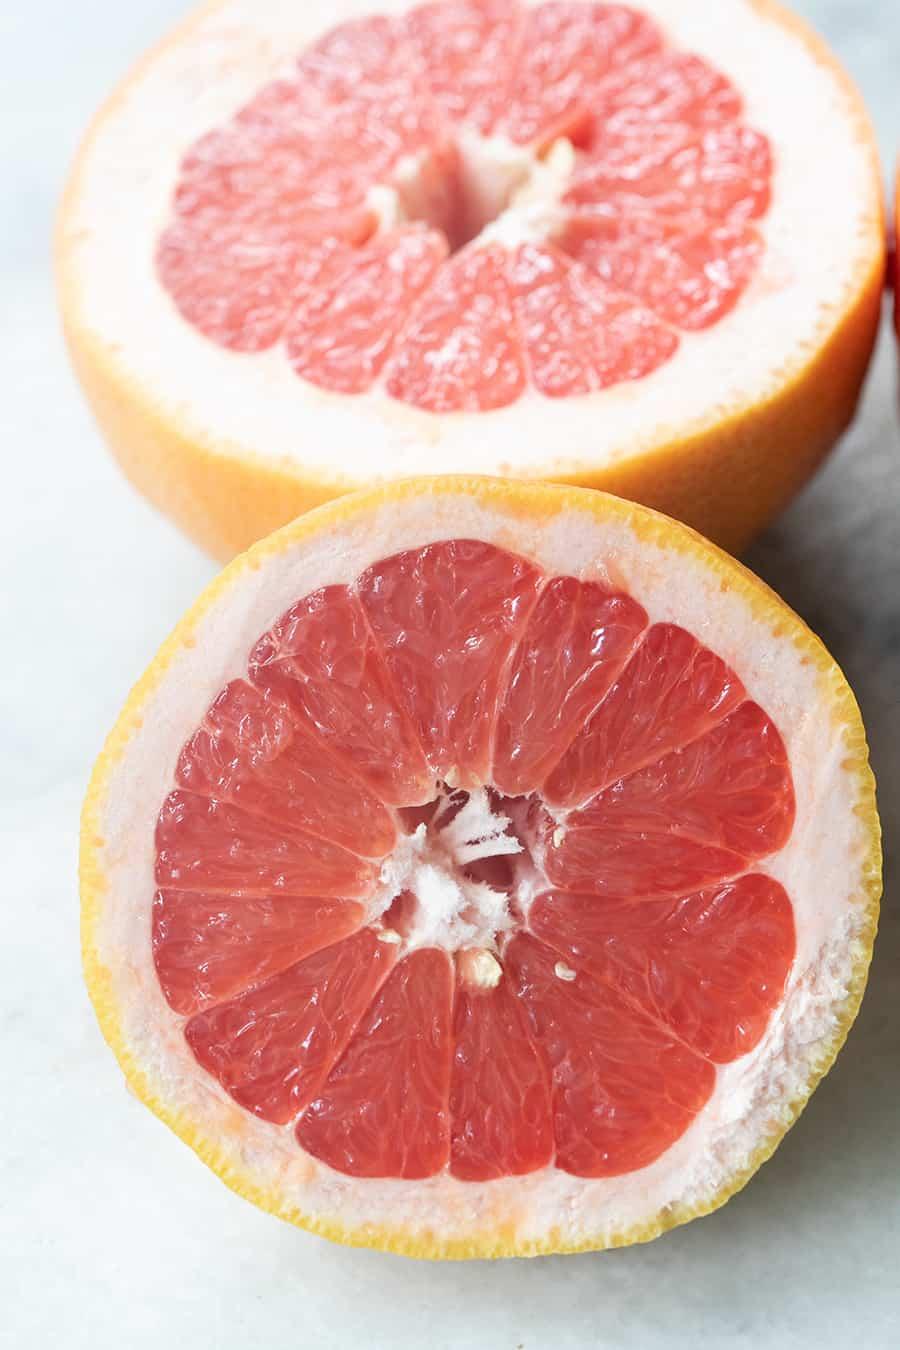 Fresh grapefruit cut in half